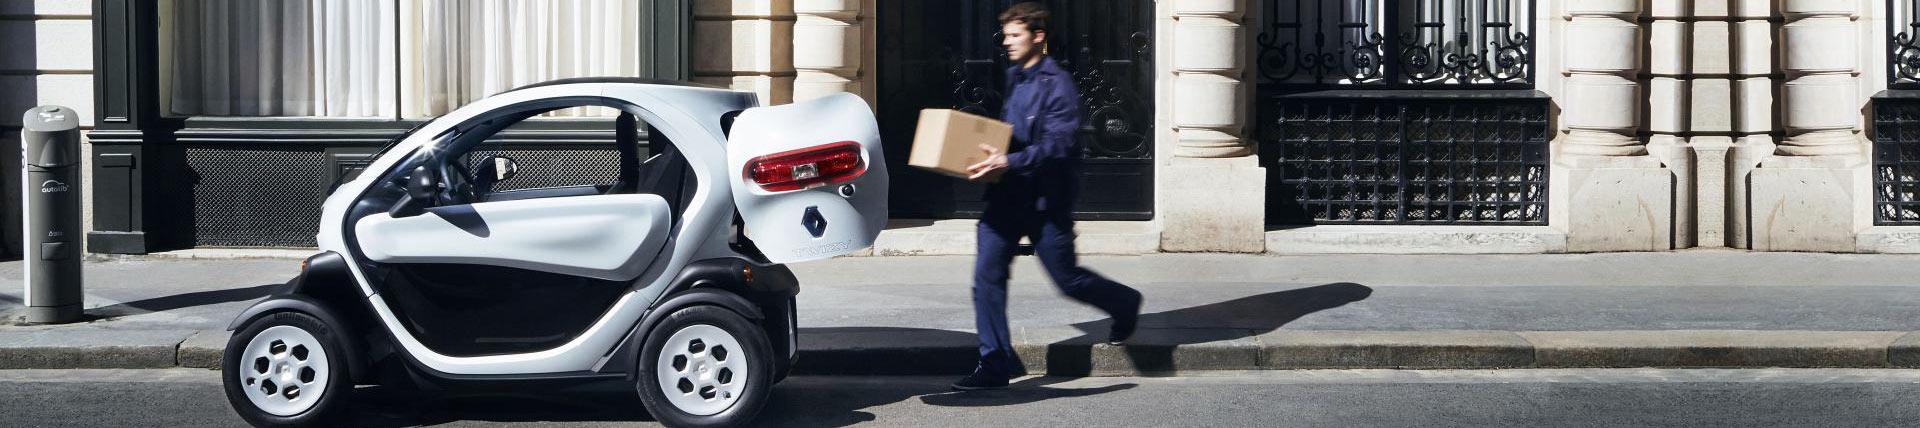 Renault Twizy Angebot